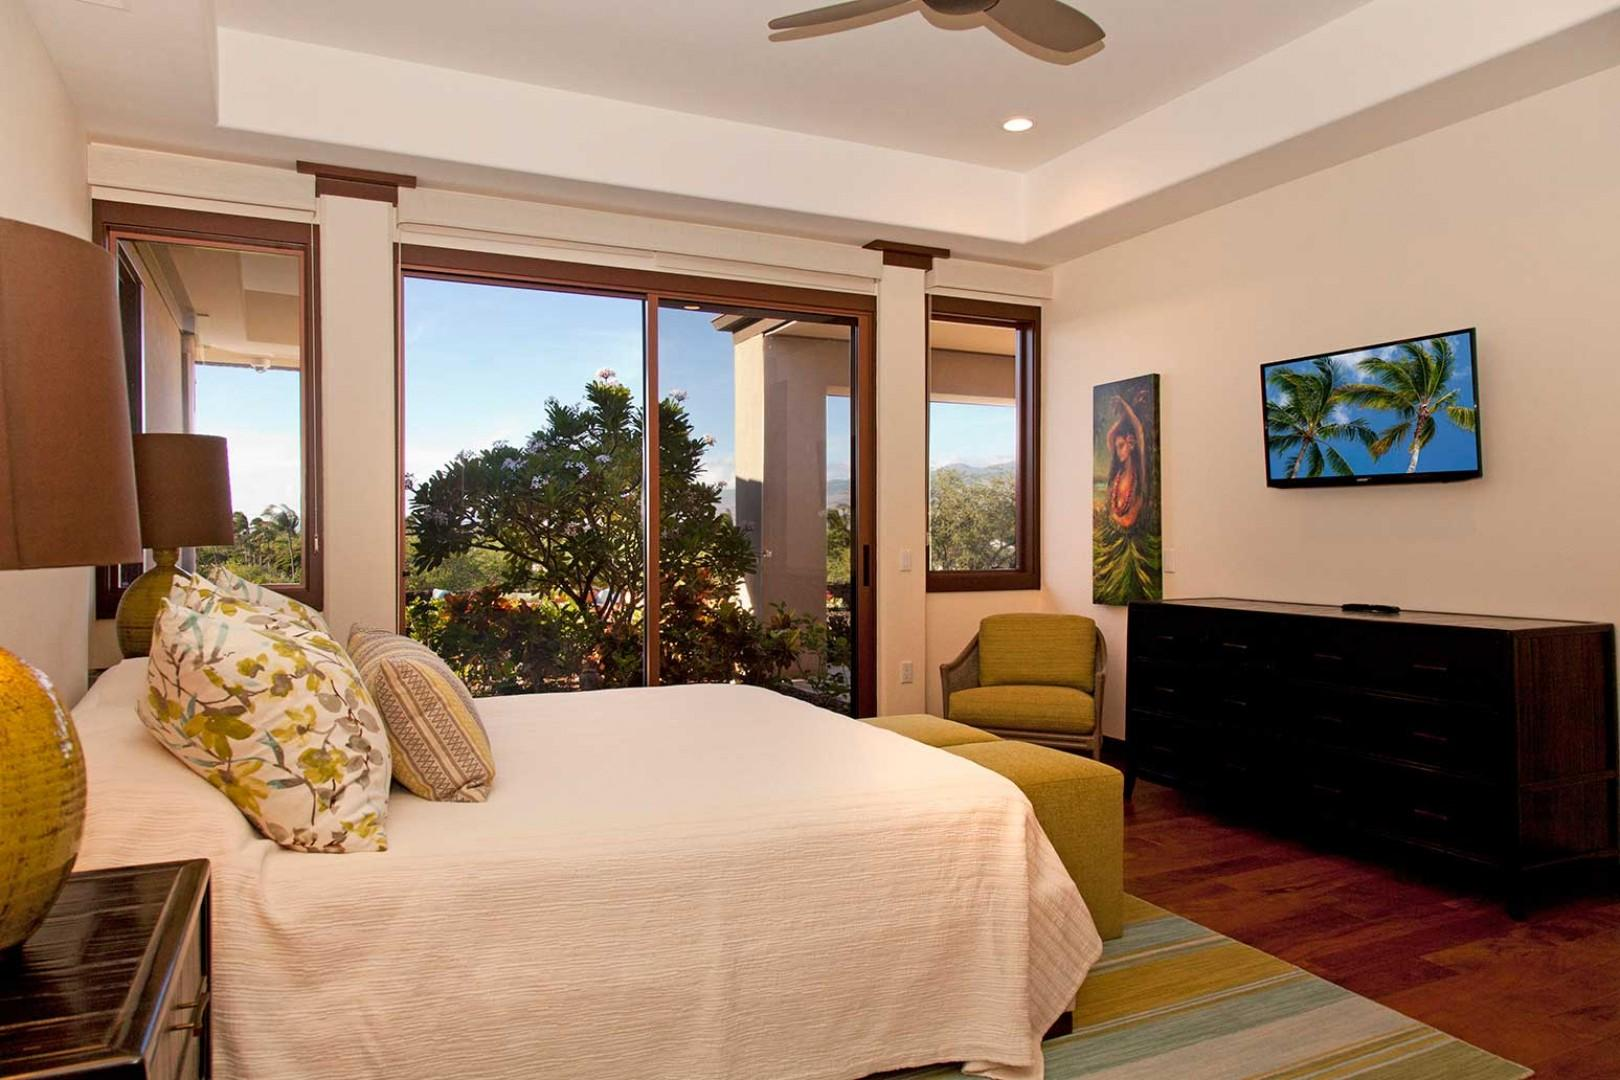 Third bedroom, with king bed, flat-screen TV, walk-in closet, en suite bath, and sliding doors to pool deck.